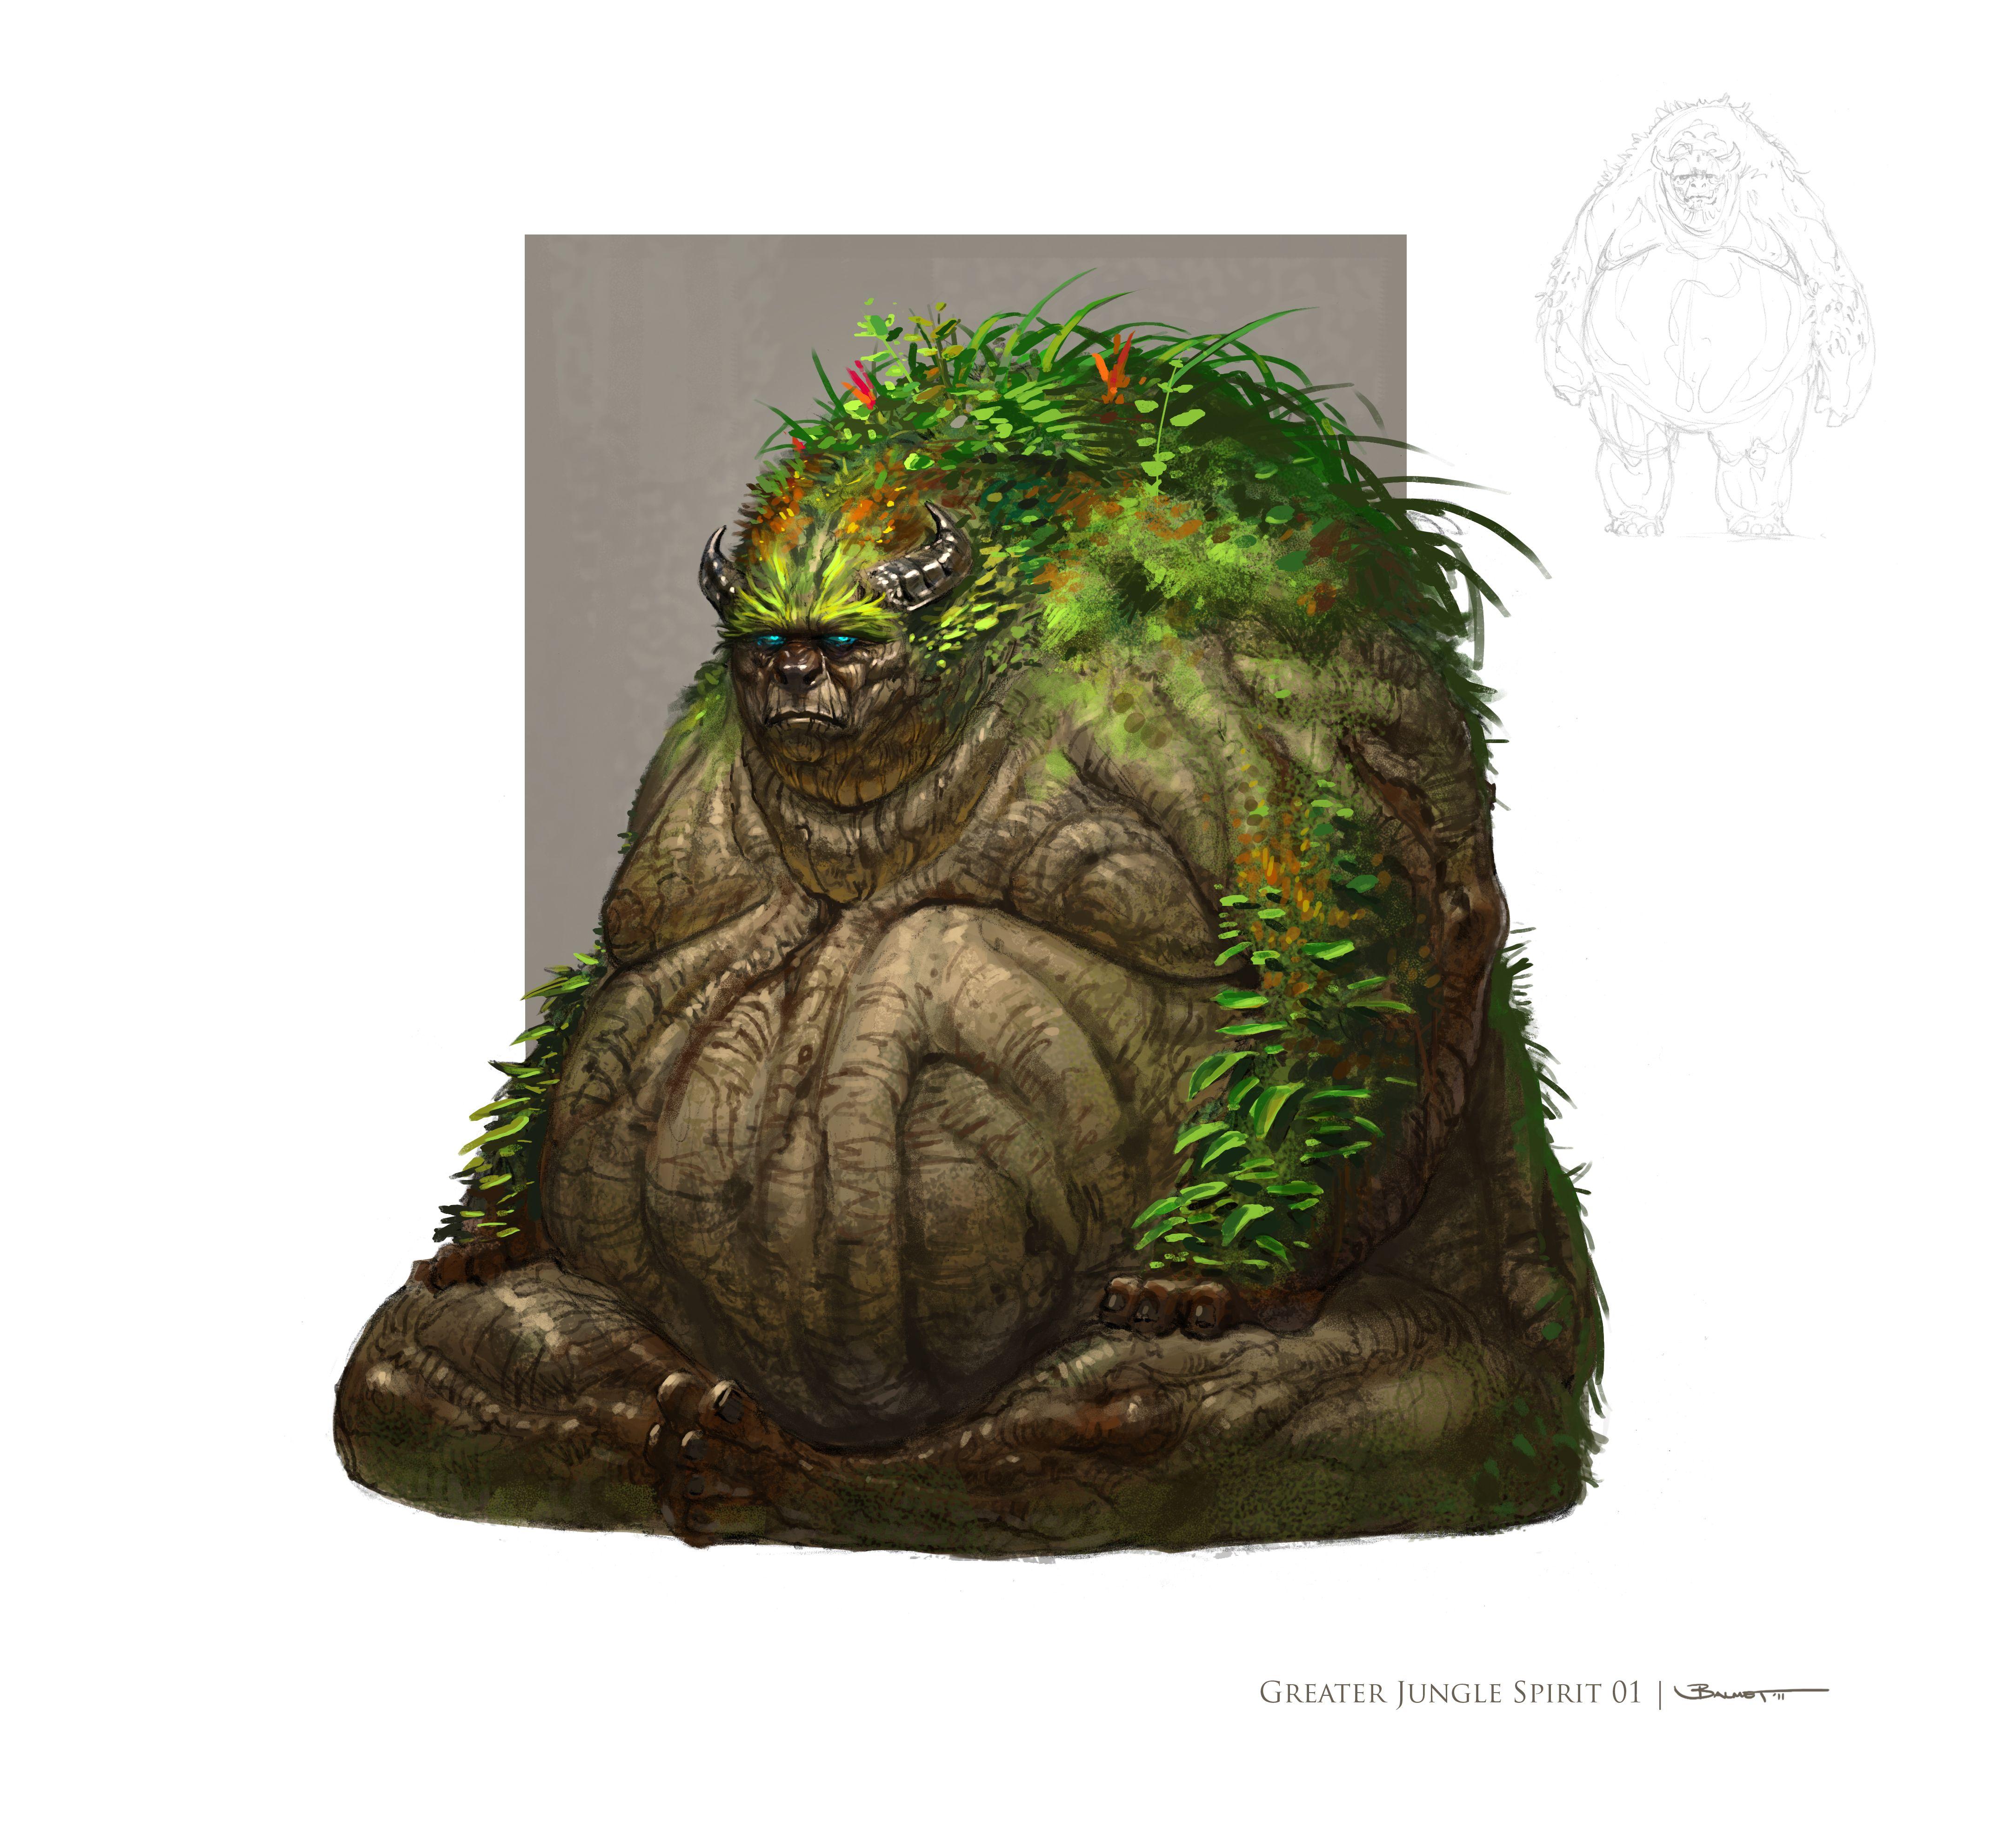 http://community.riftgame.com/wp-content/uploads/2011/10/Spirit_Jungle_Greater_01.jpg